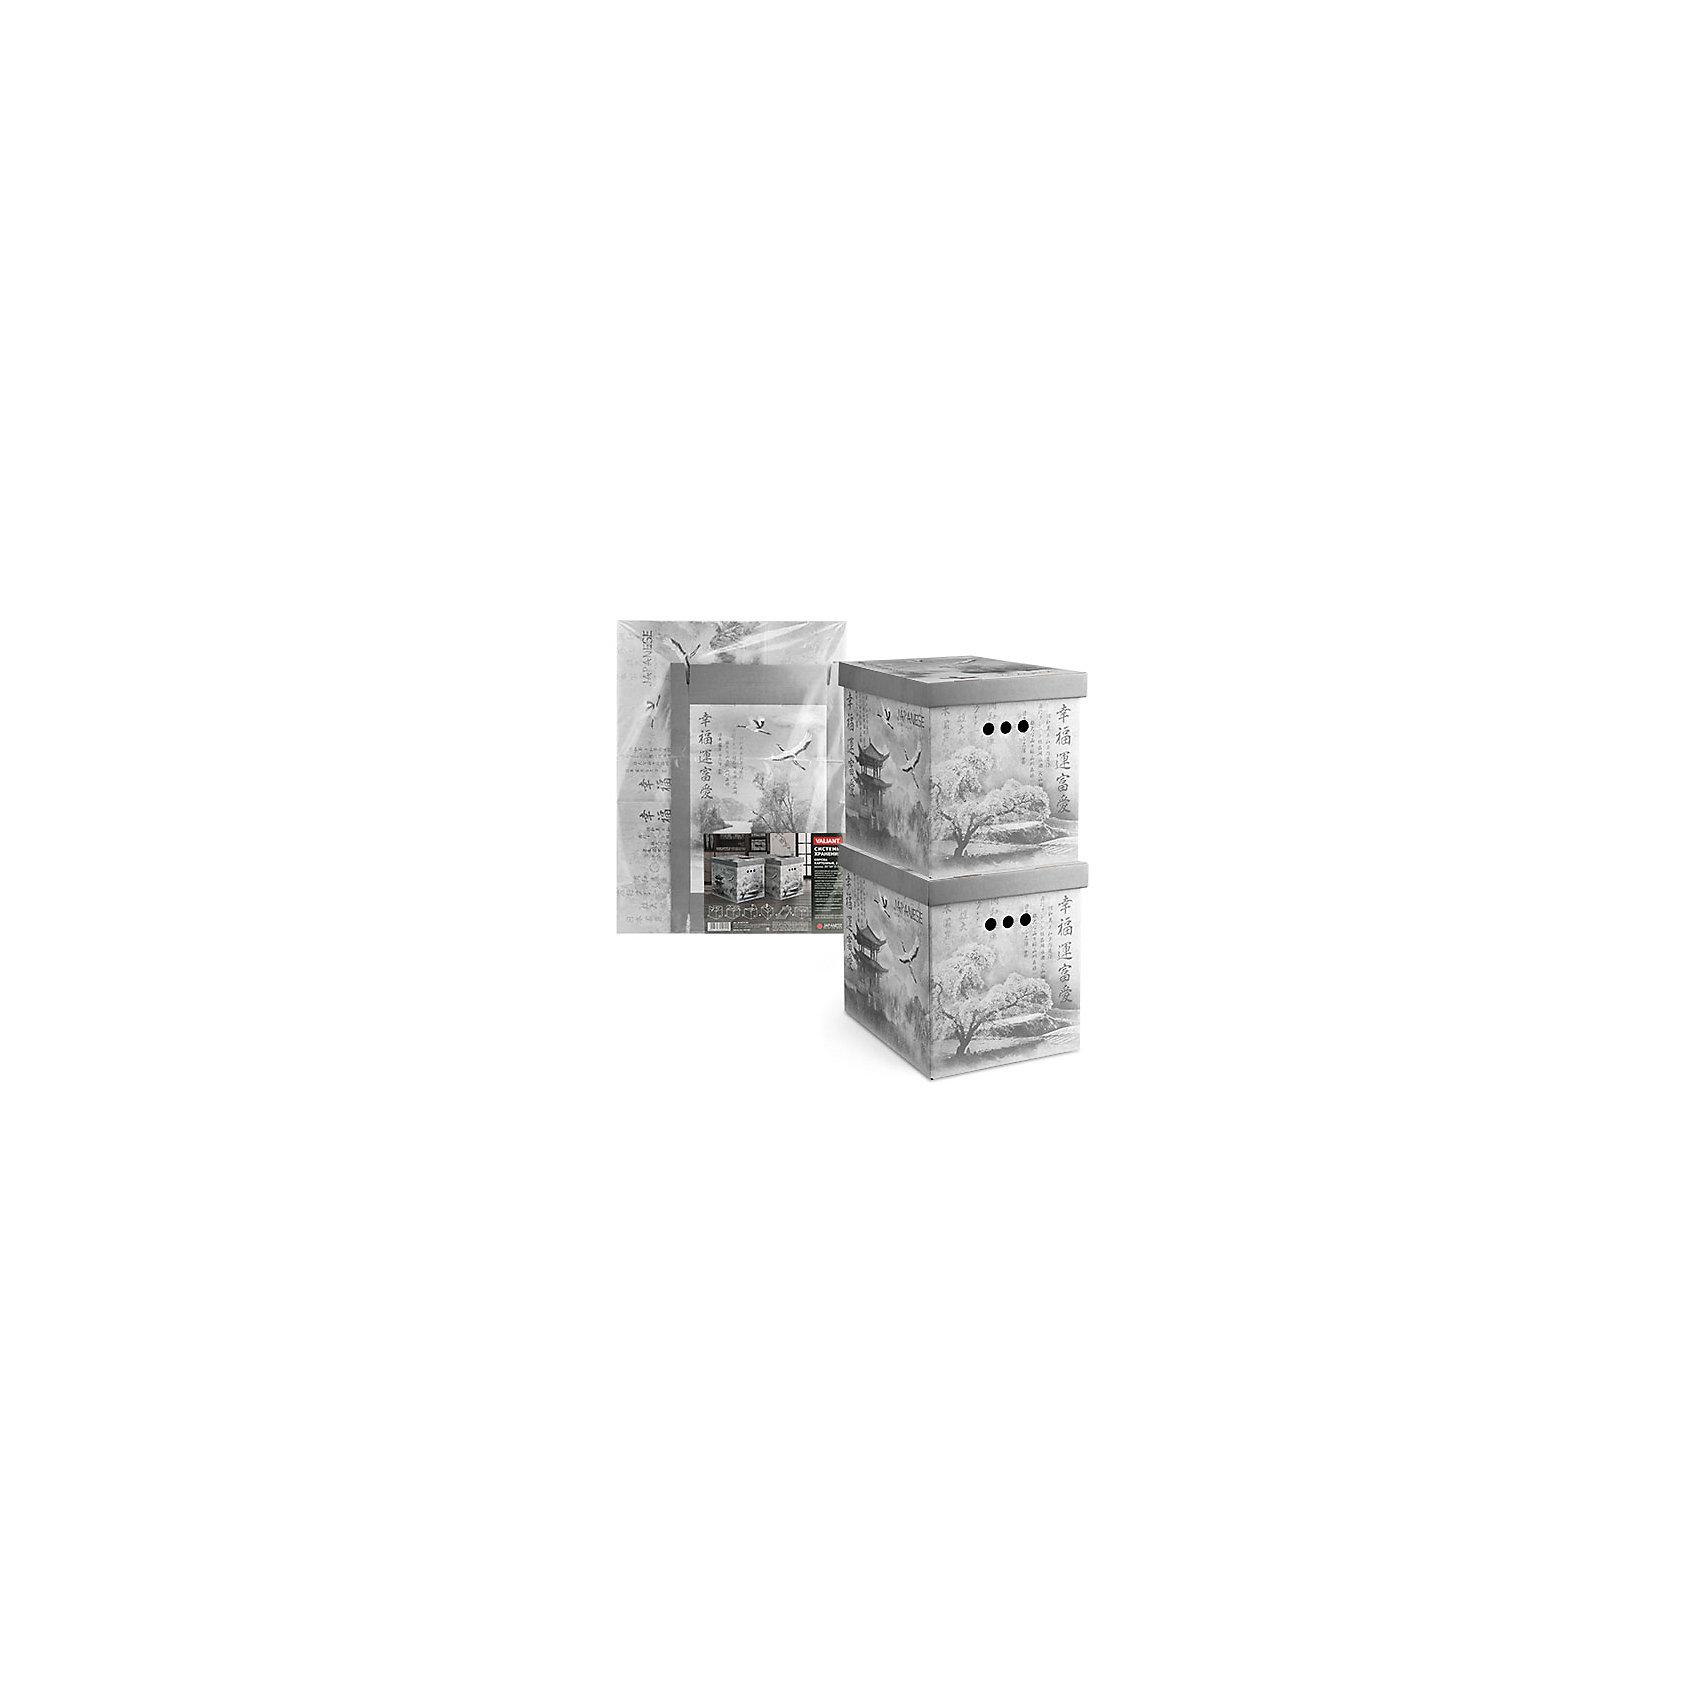 VALIANT Короб картонный, складной, большой, 28*38*31.5 см, 2 шт., JAPANESE BLACK, Valiant